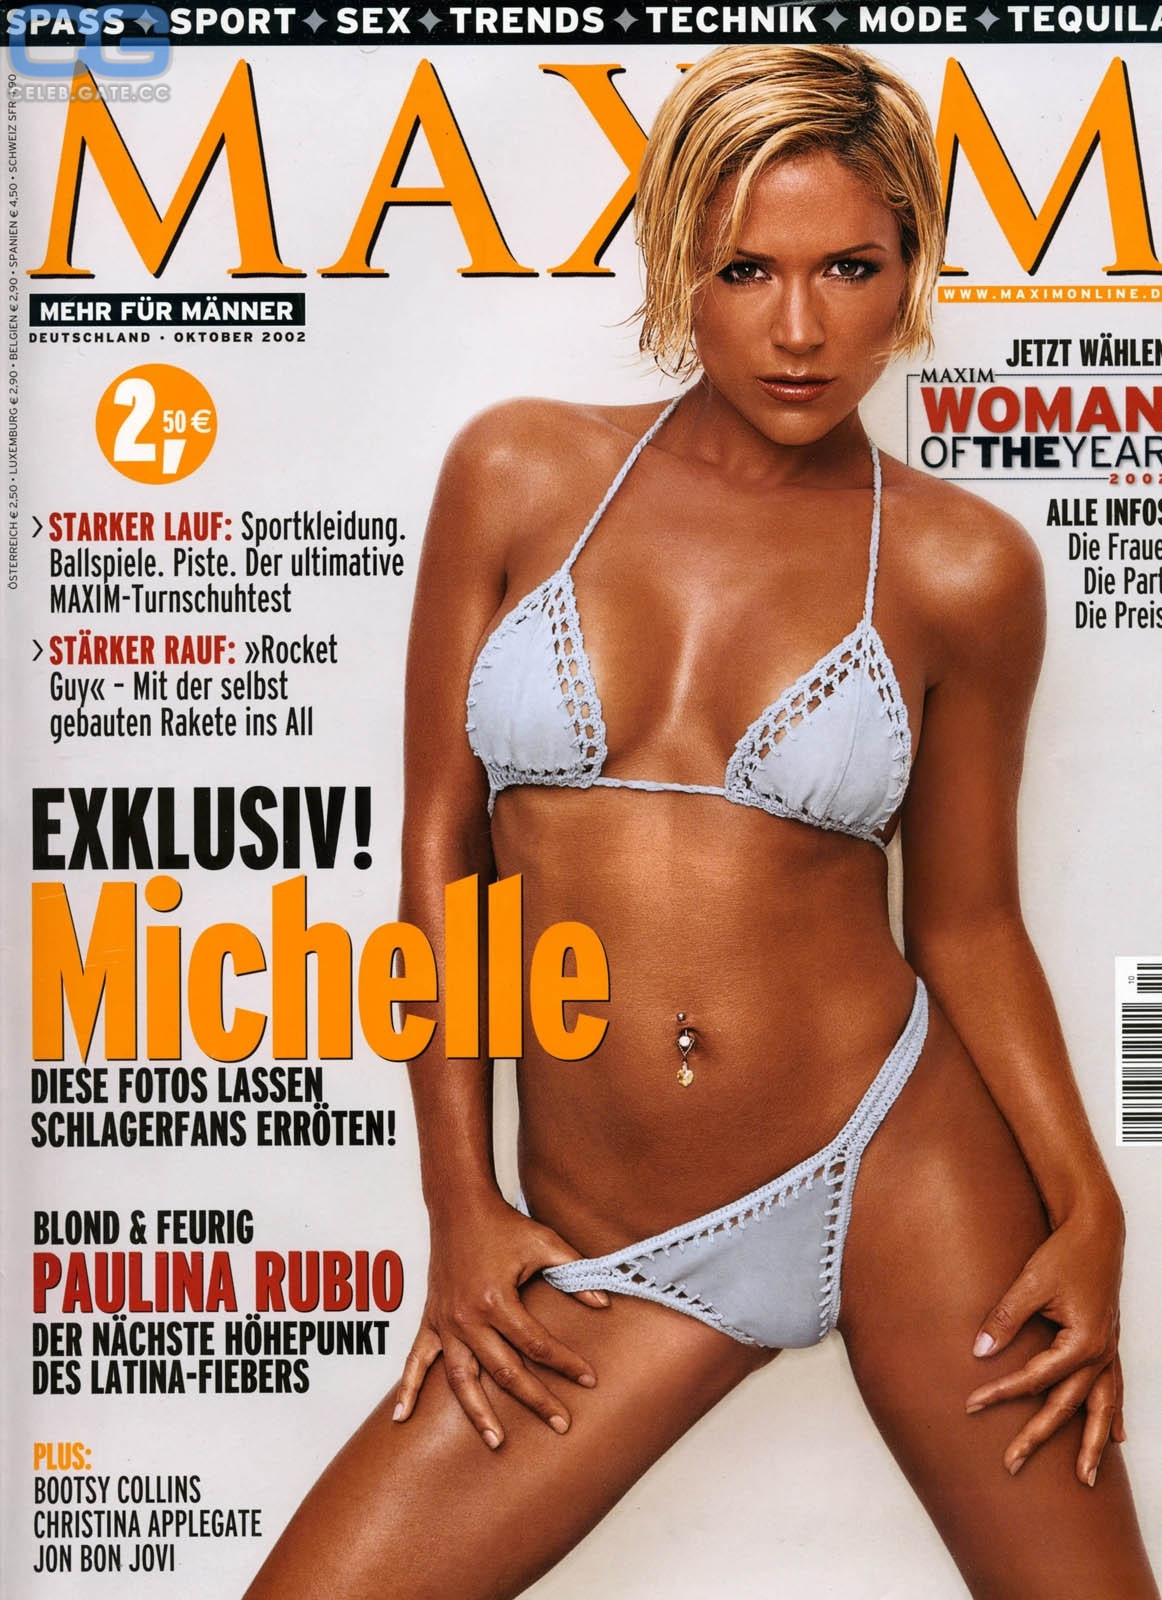 Jenneke nackt Michelle  Michelle Jenneke